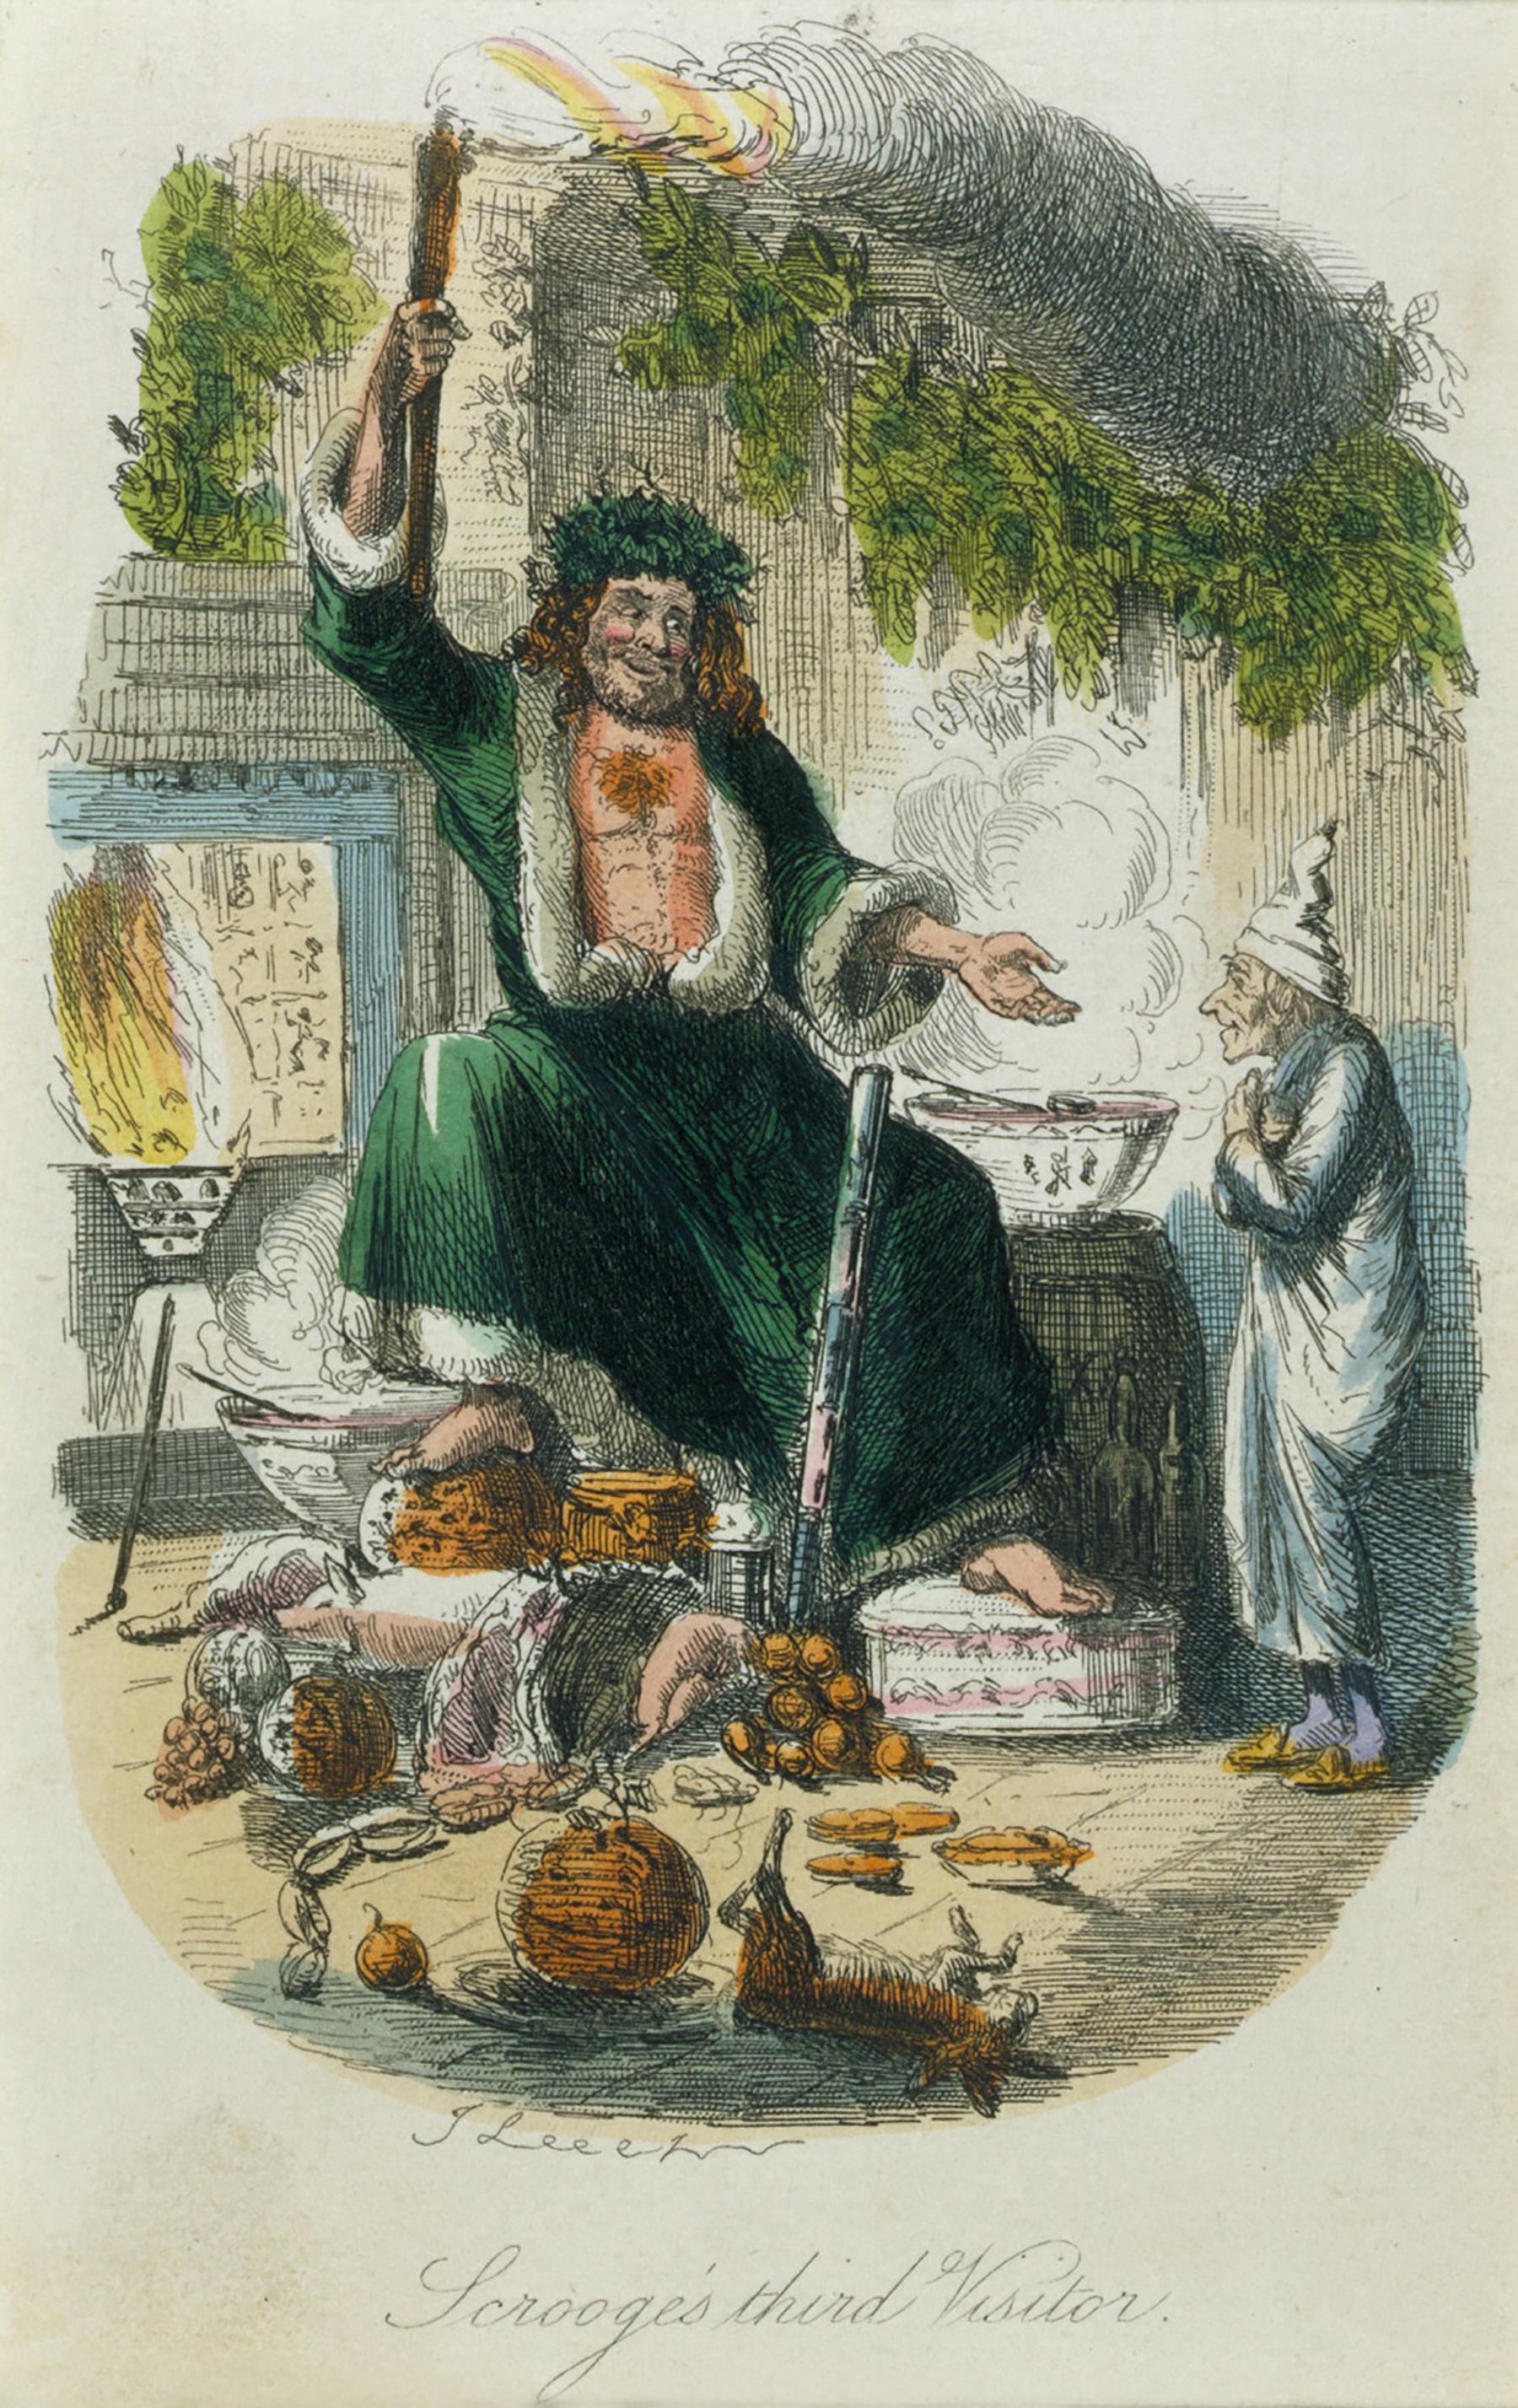 11_Y Dicken's christmas carole origional christmas present